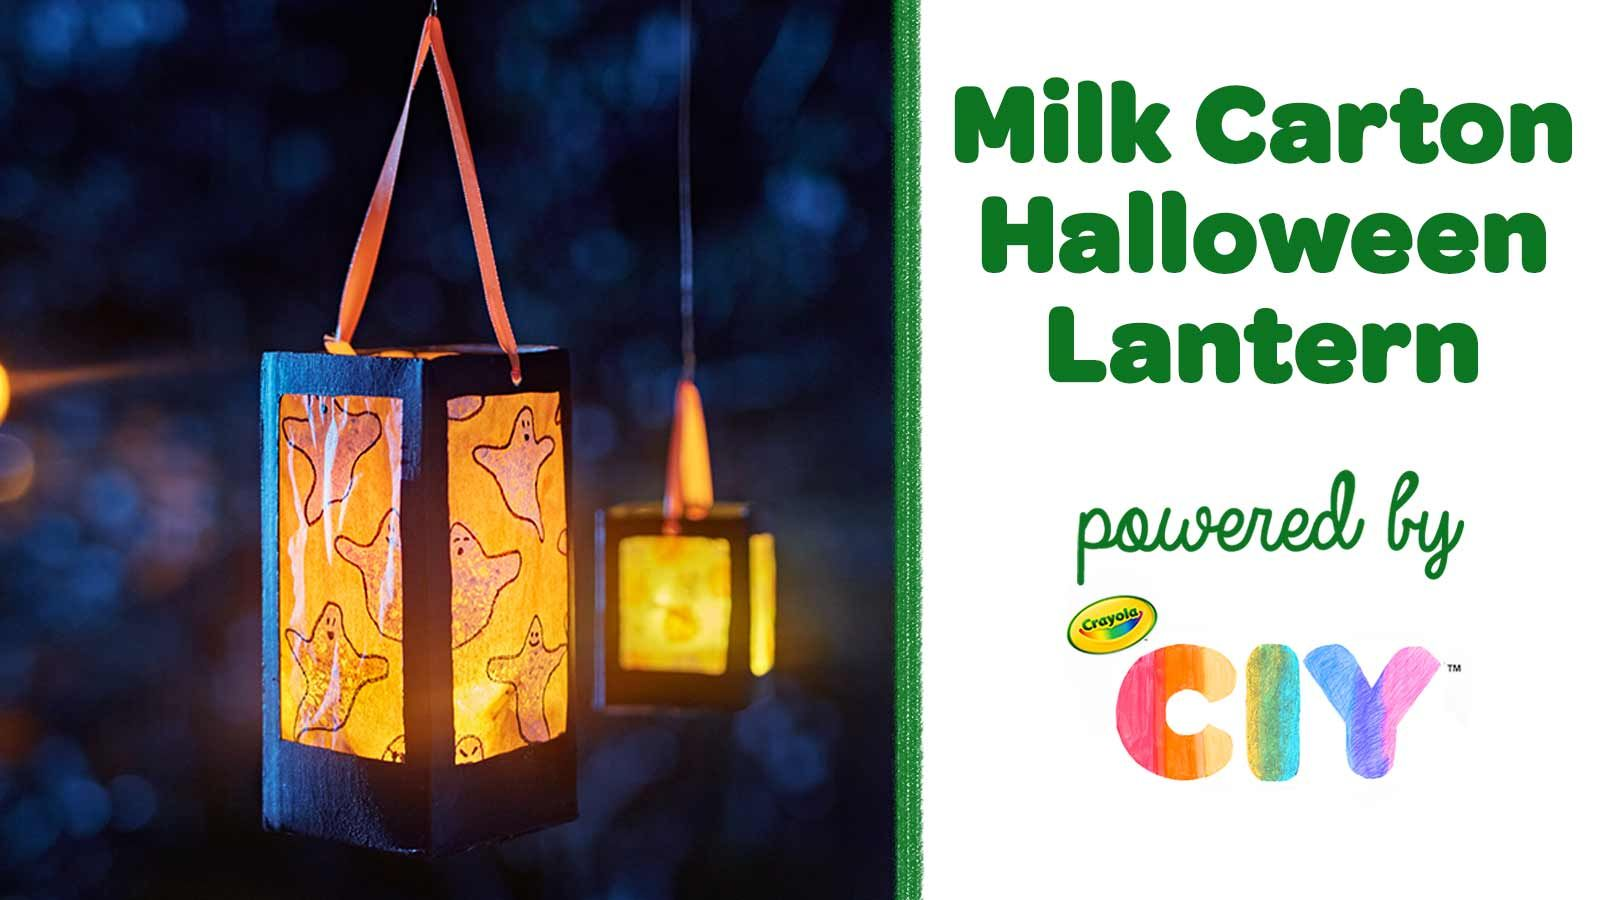 Halloween 2020 Nome Milk Milk Carton Halloween Lantern in 2020 | Halloween lanterns, Easy